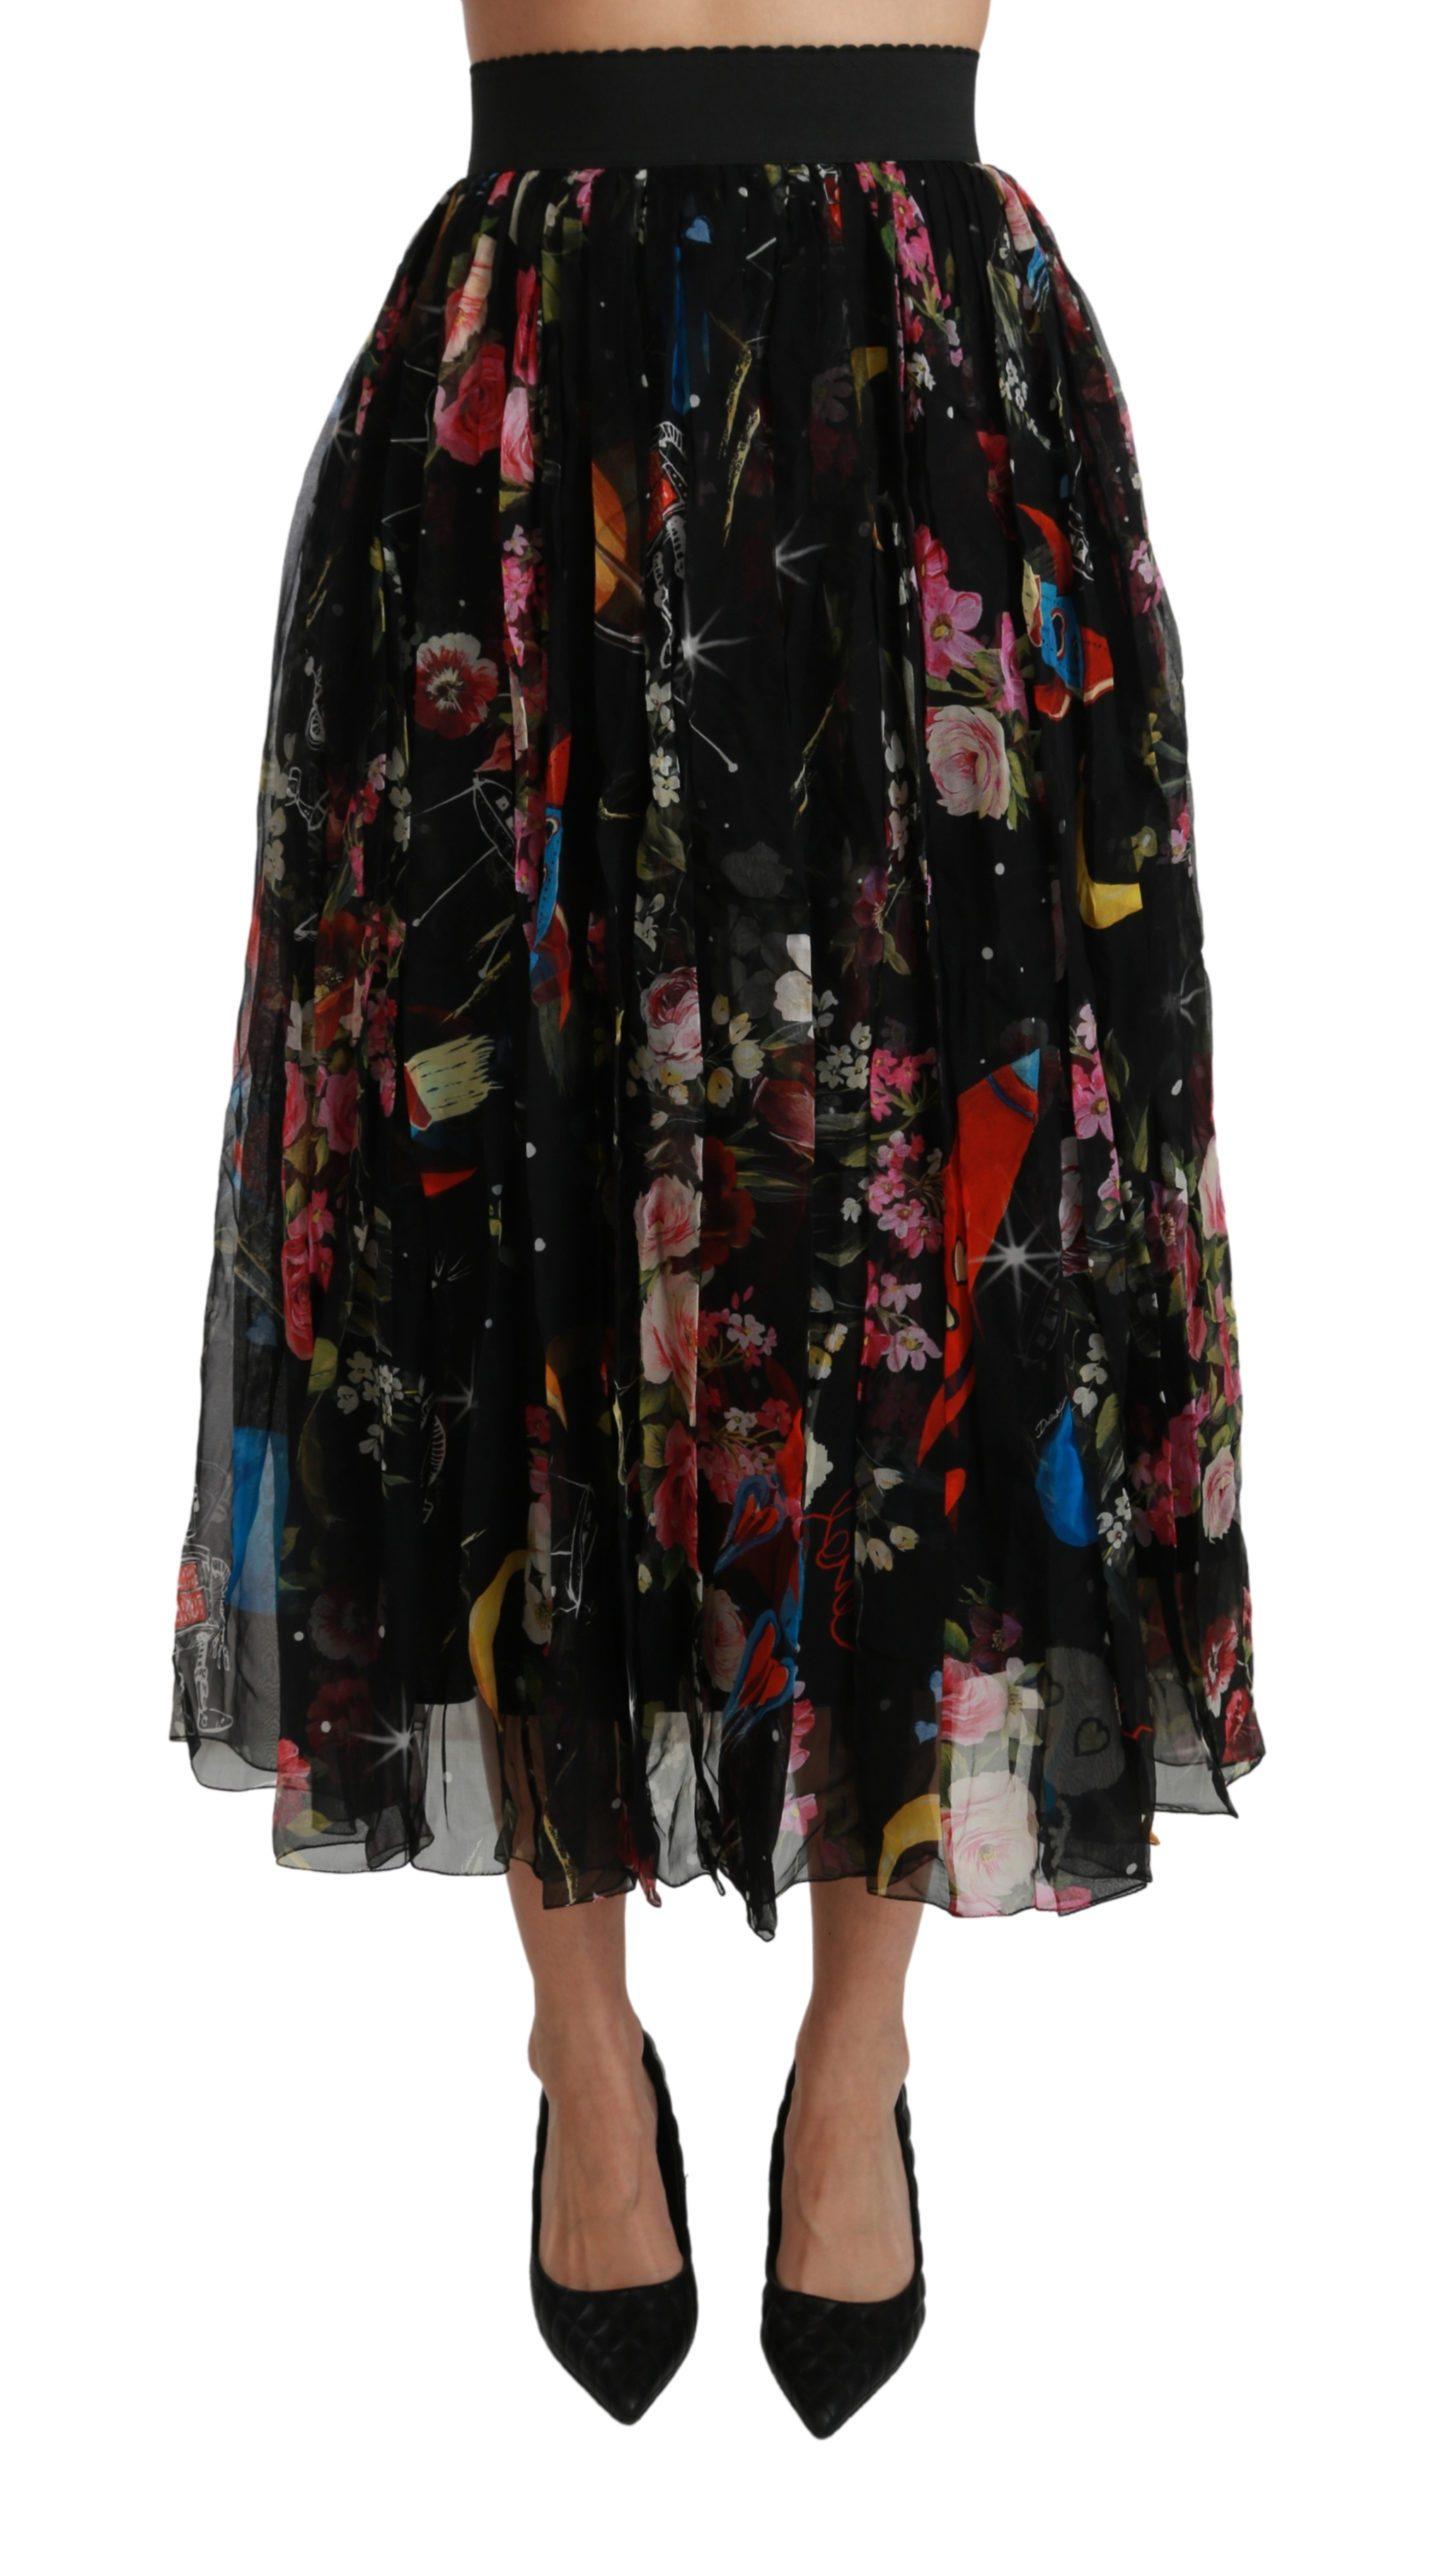 Dolce & Gabbana Women's Floral High Waist Pleated Skirt Black SKI1405 - IT44 L